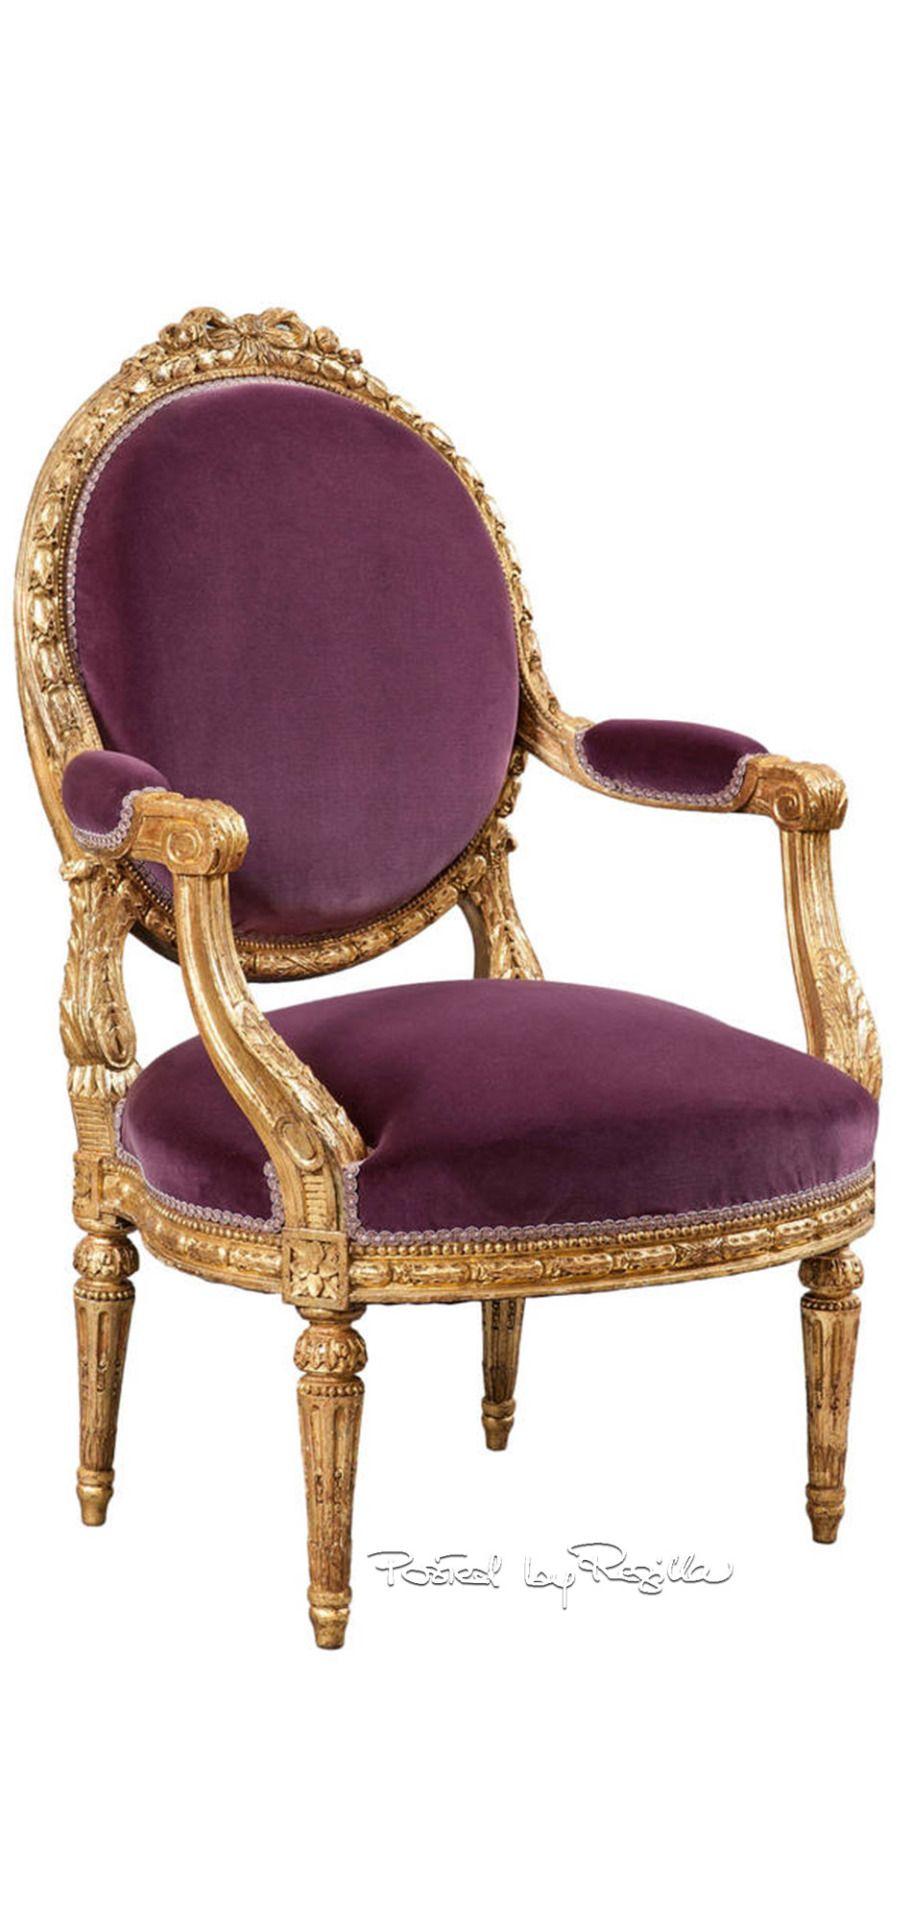 Louis Xvi Neo Classic French Neoclassic Louis Xvi 1760 1789 Motifs